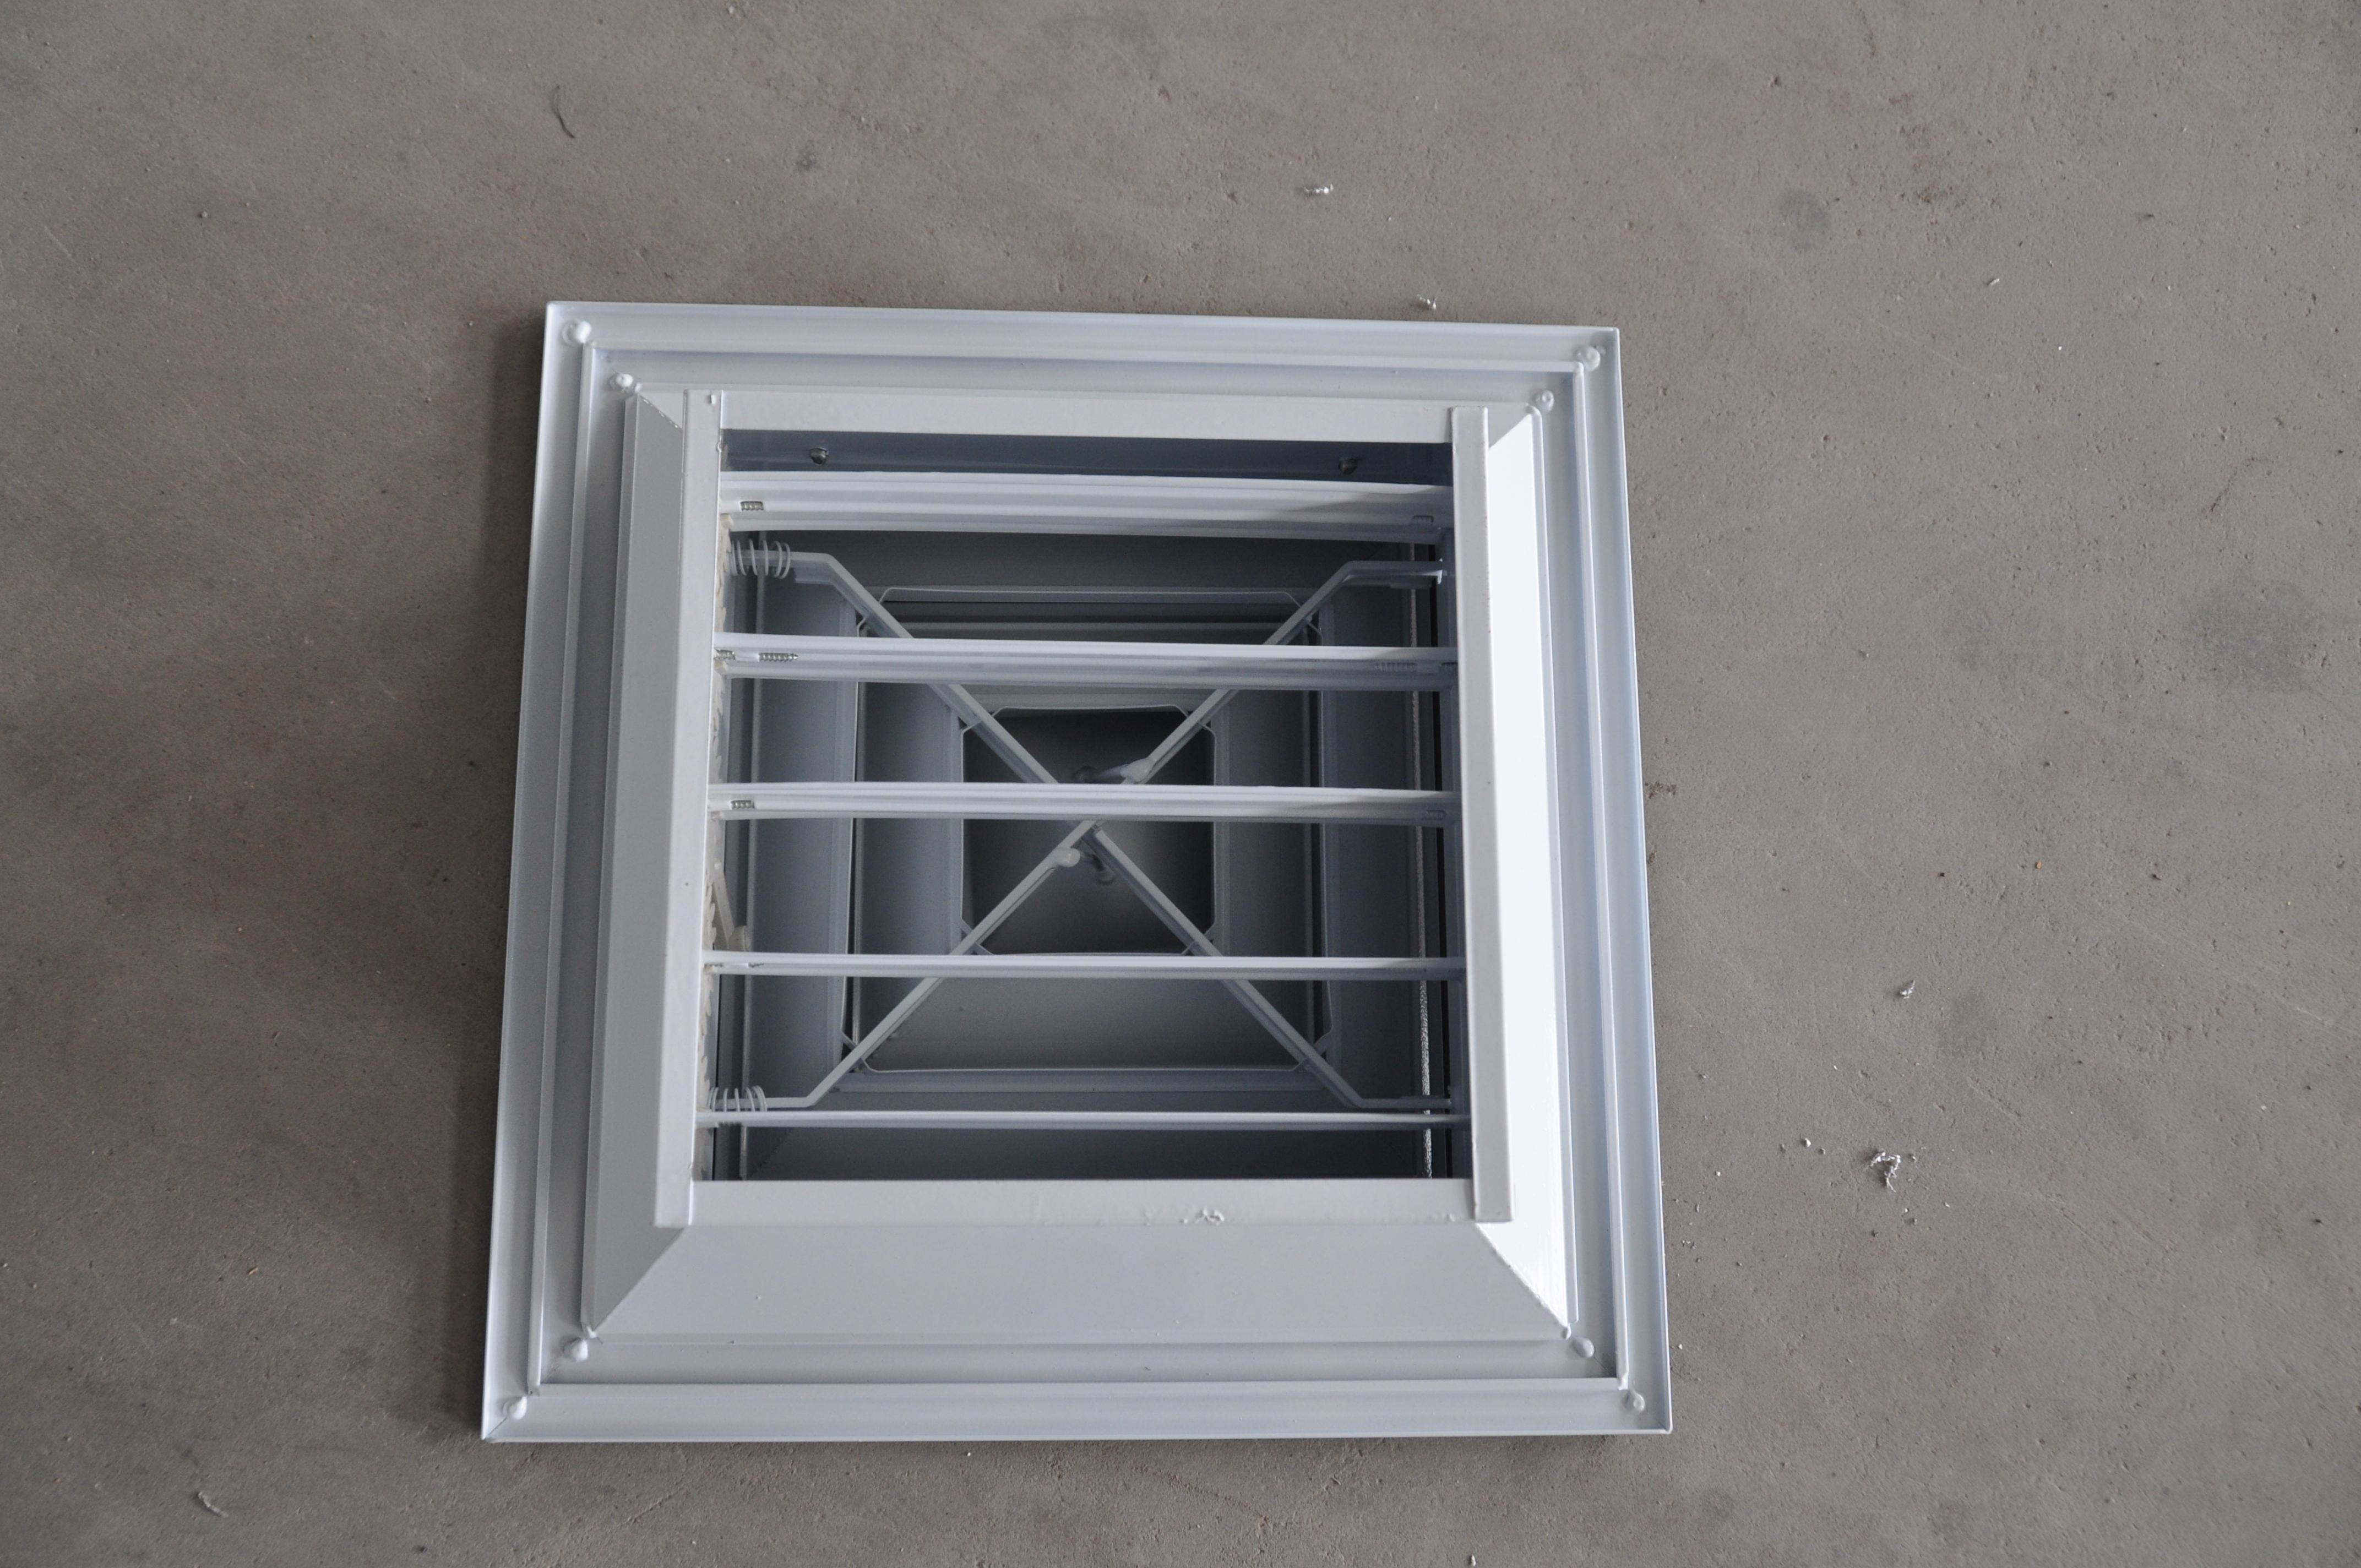 方形散流器 方形散流器批发 方形散流器厂家